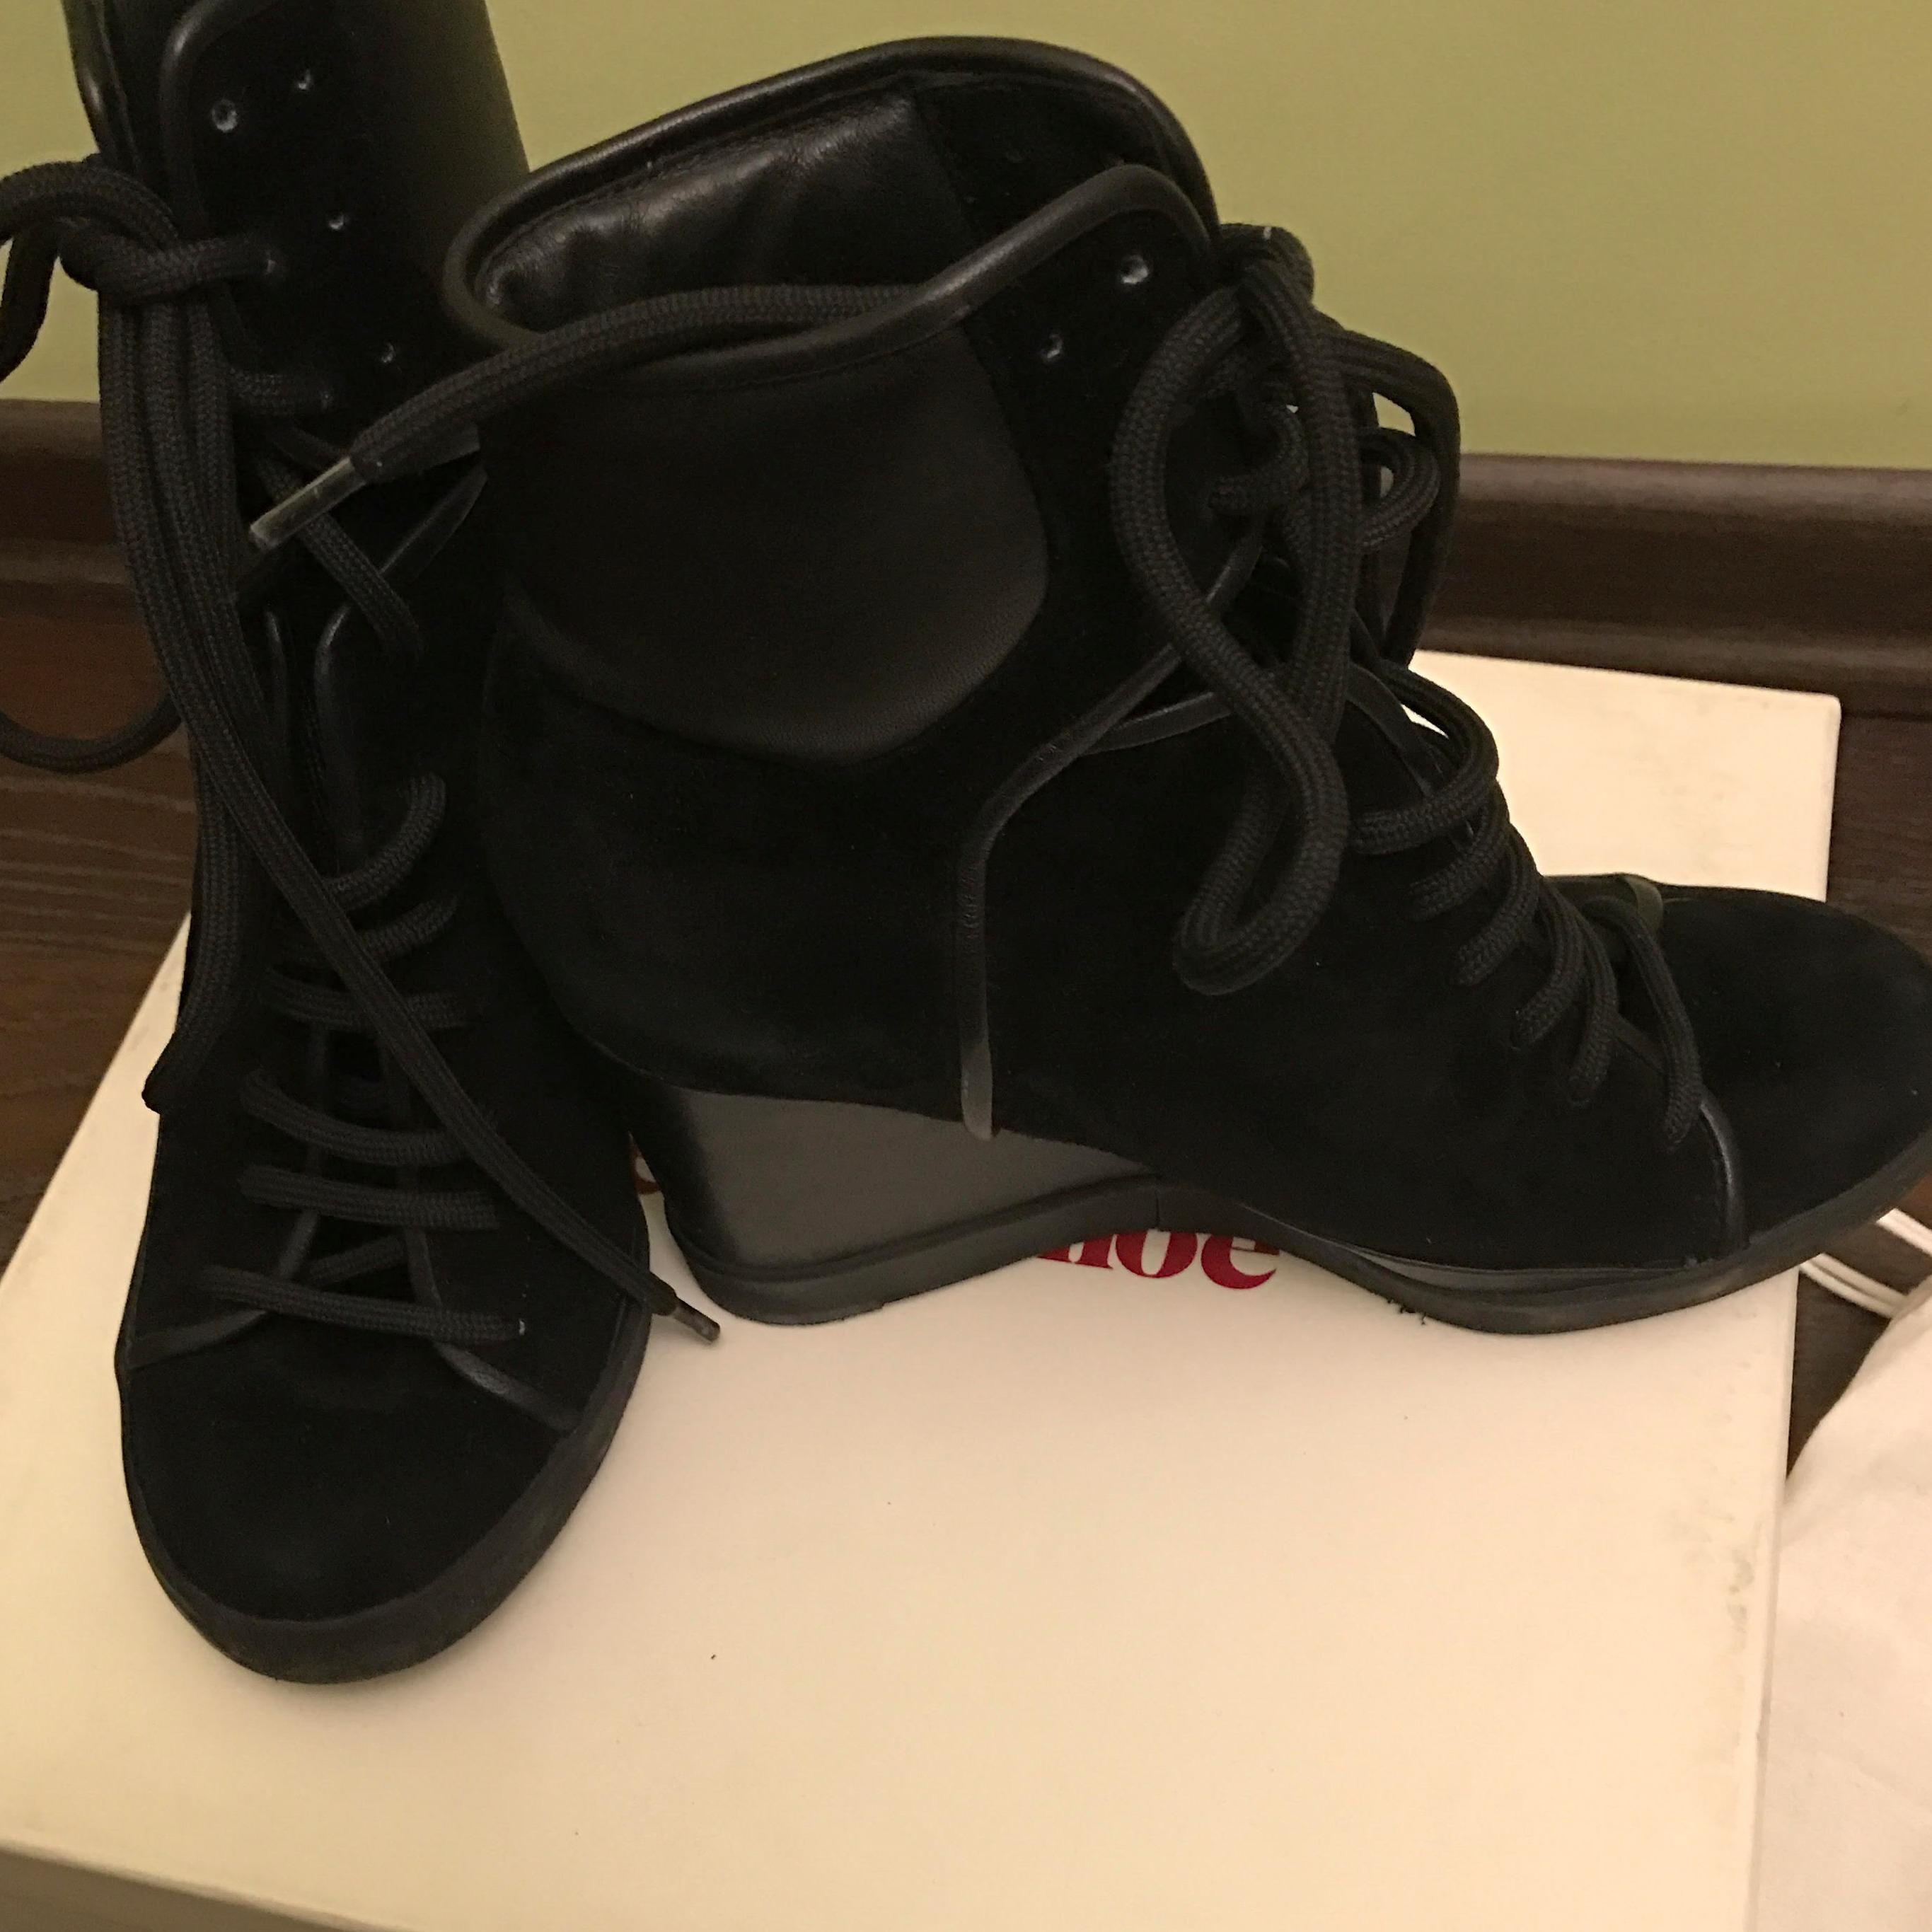 e450e1f3c881 Купить ботинки See by Chloé за 7000 руб. в интернет магазине ...